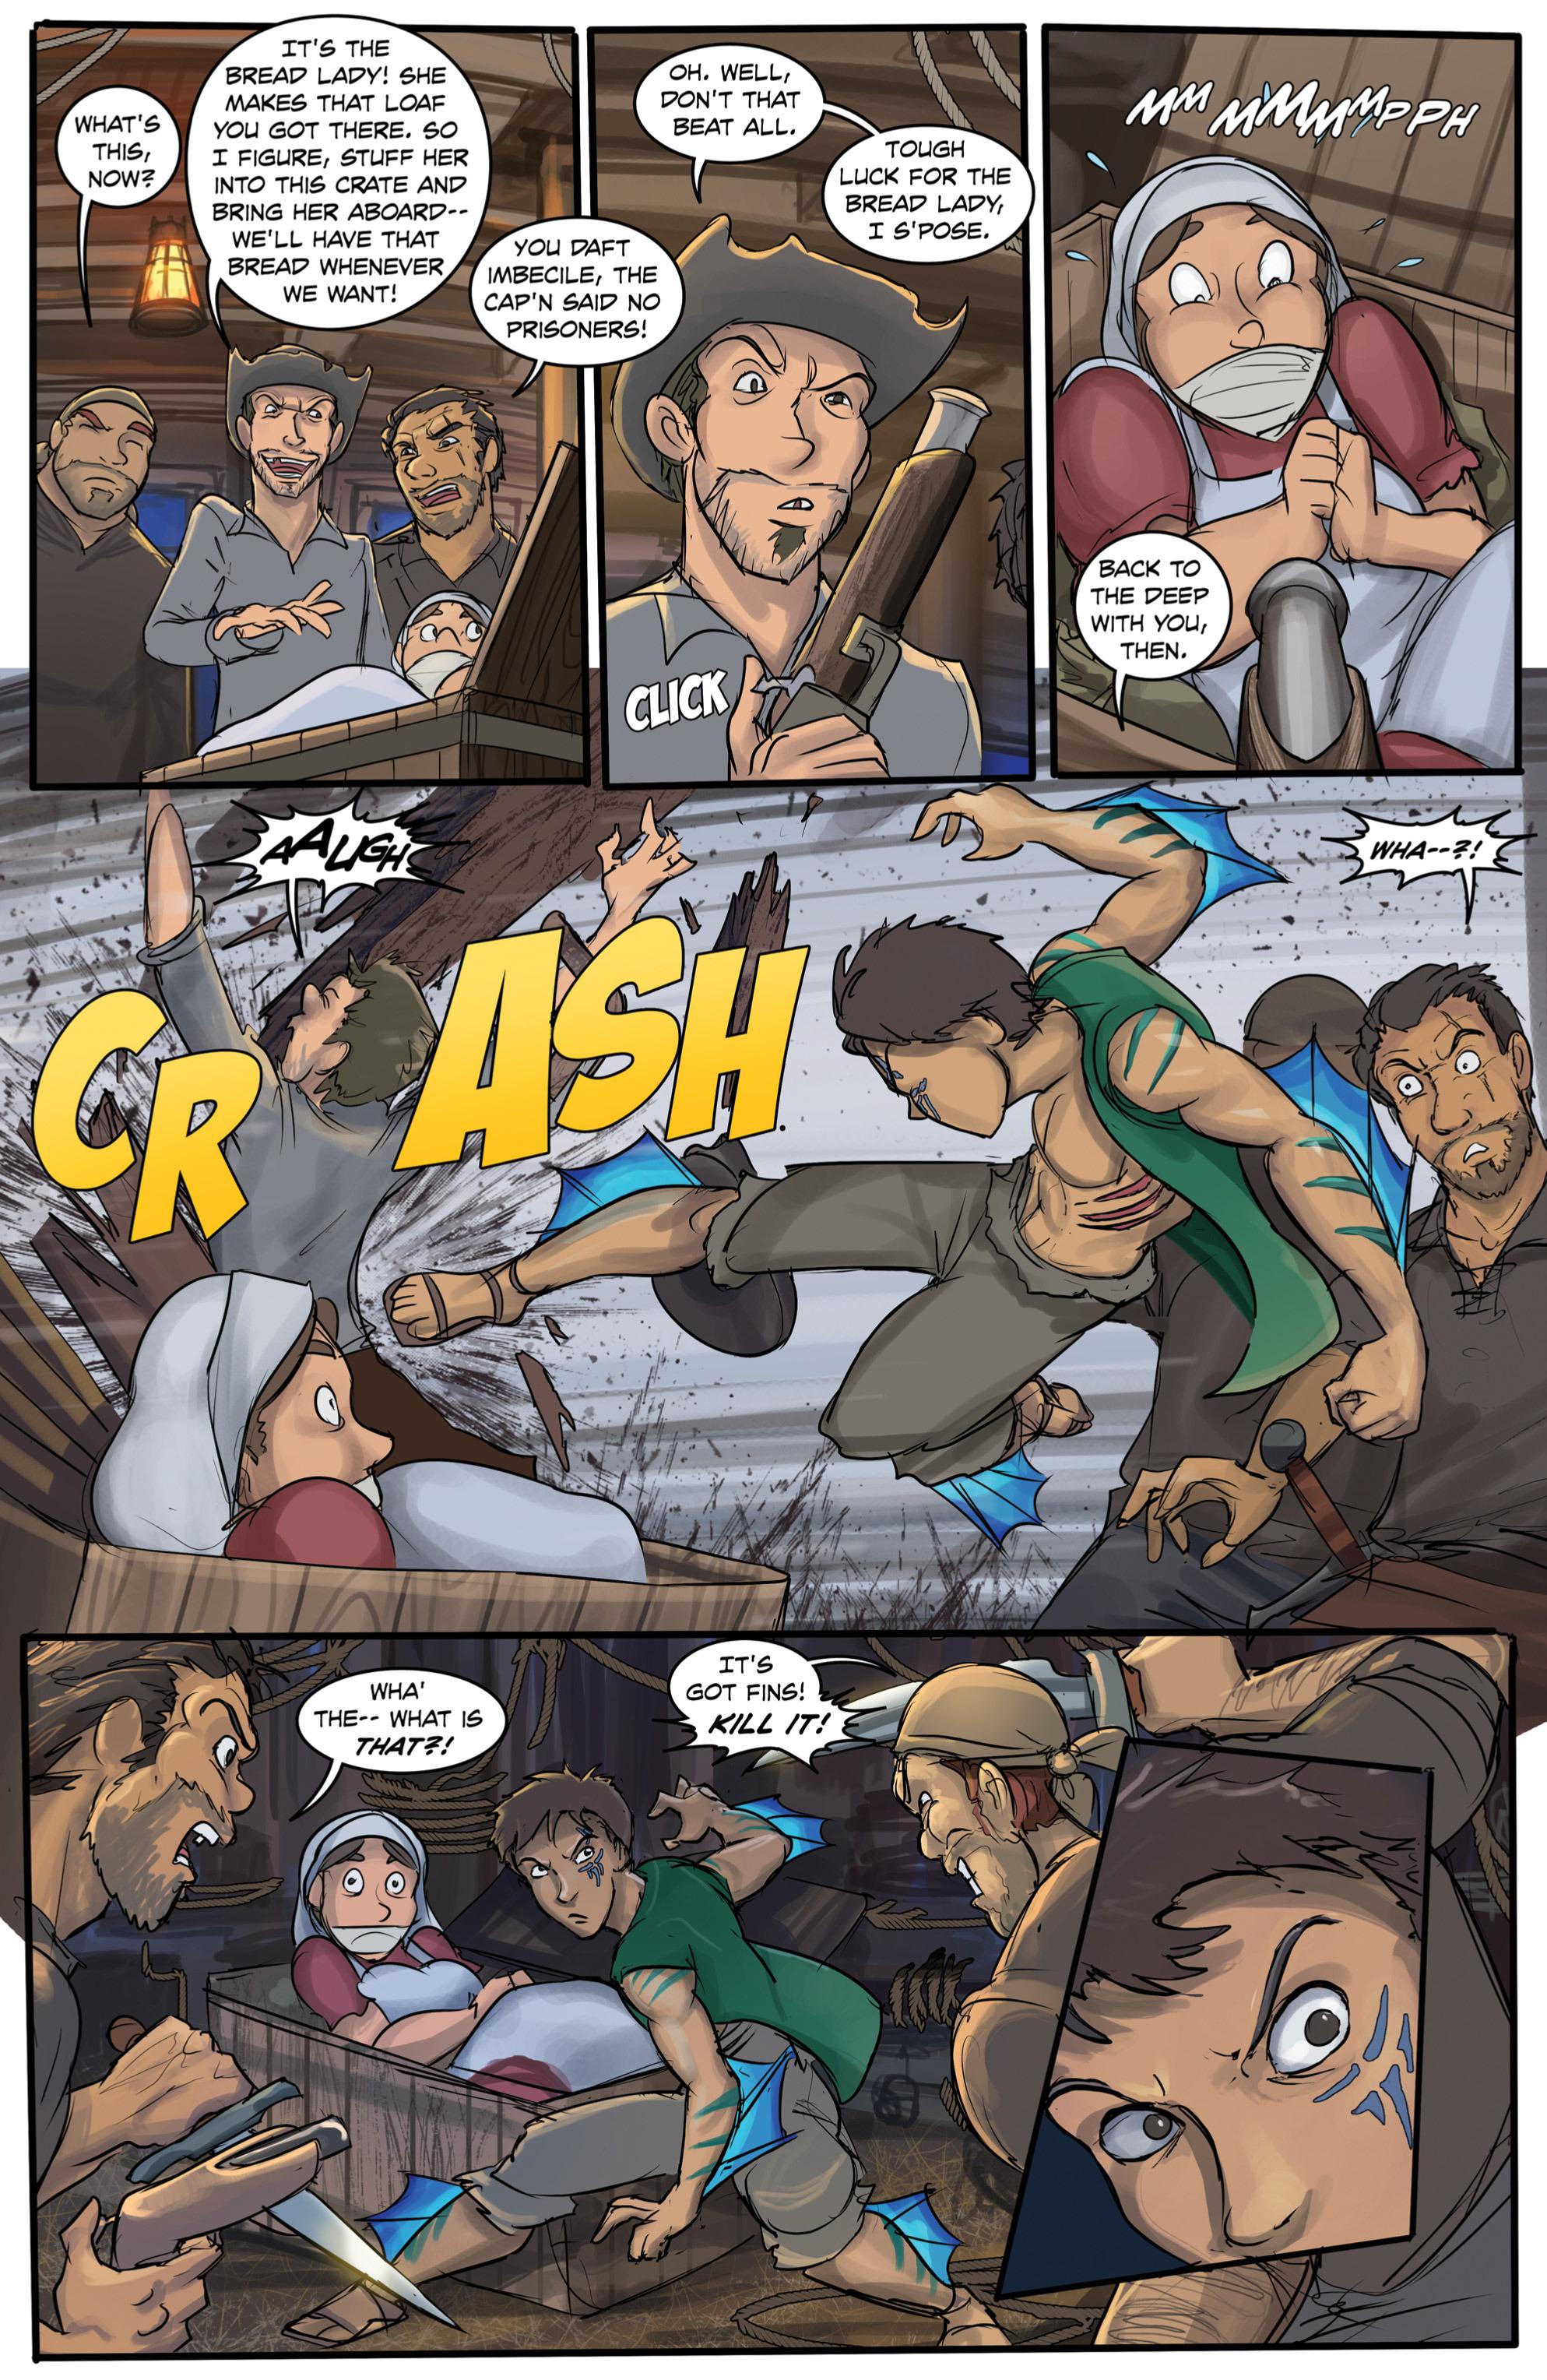 Read online Anne Bonnie comic -  Issue #6 - 7